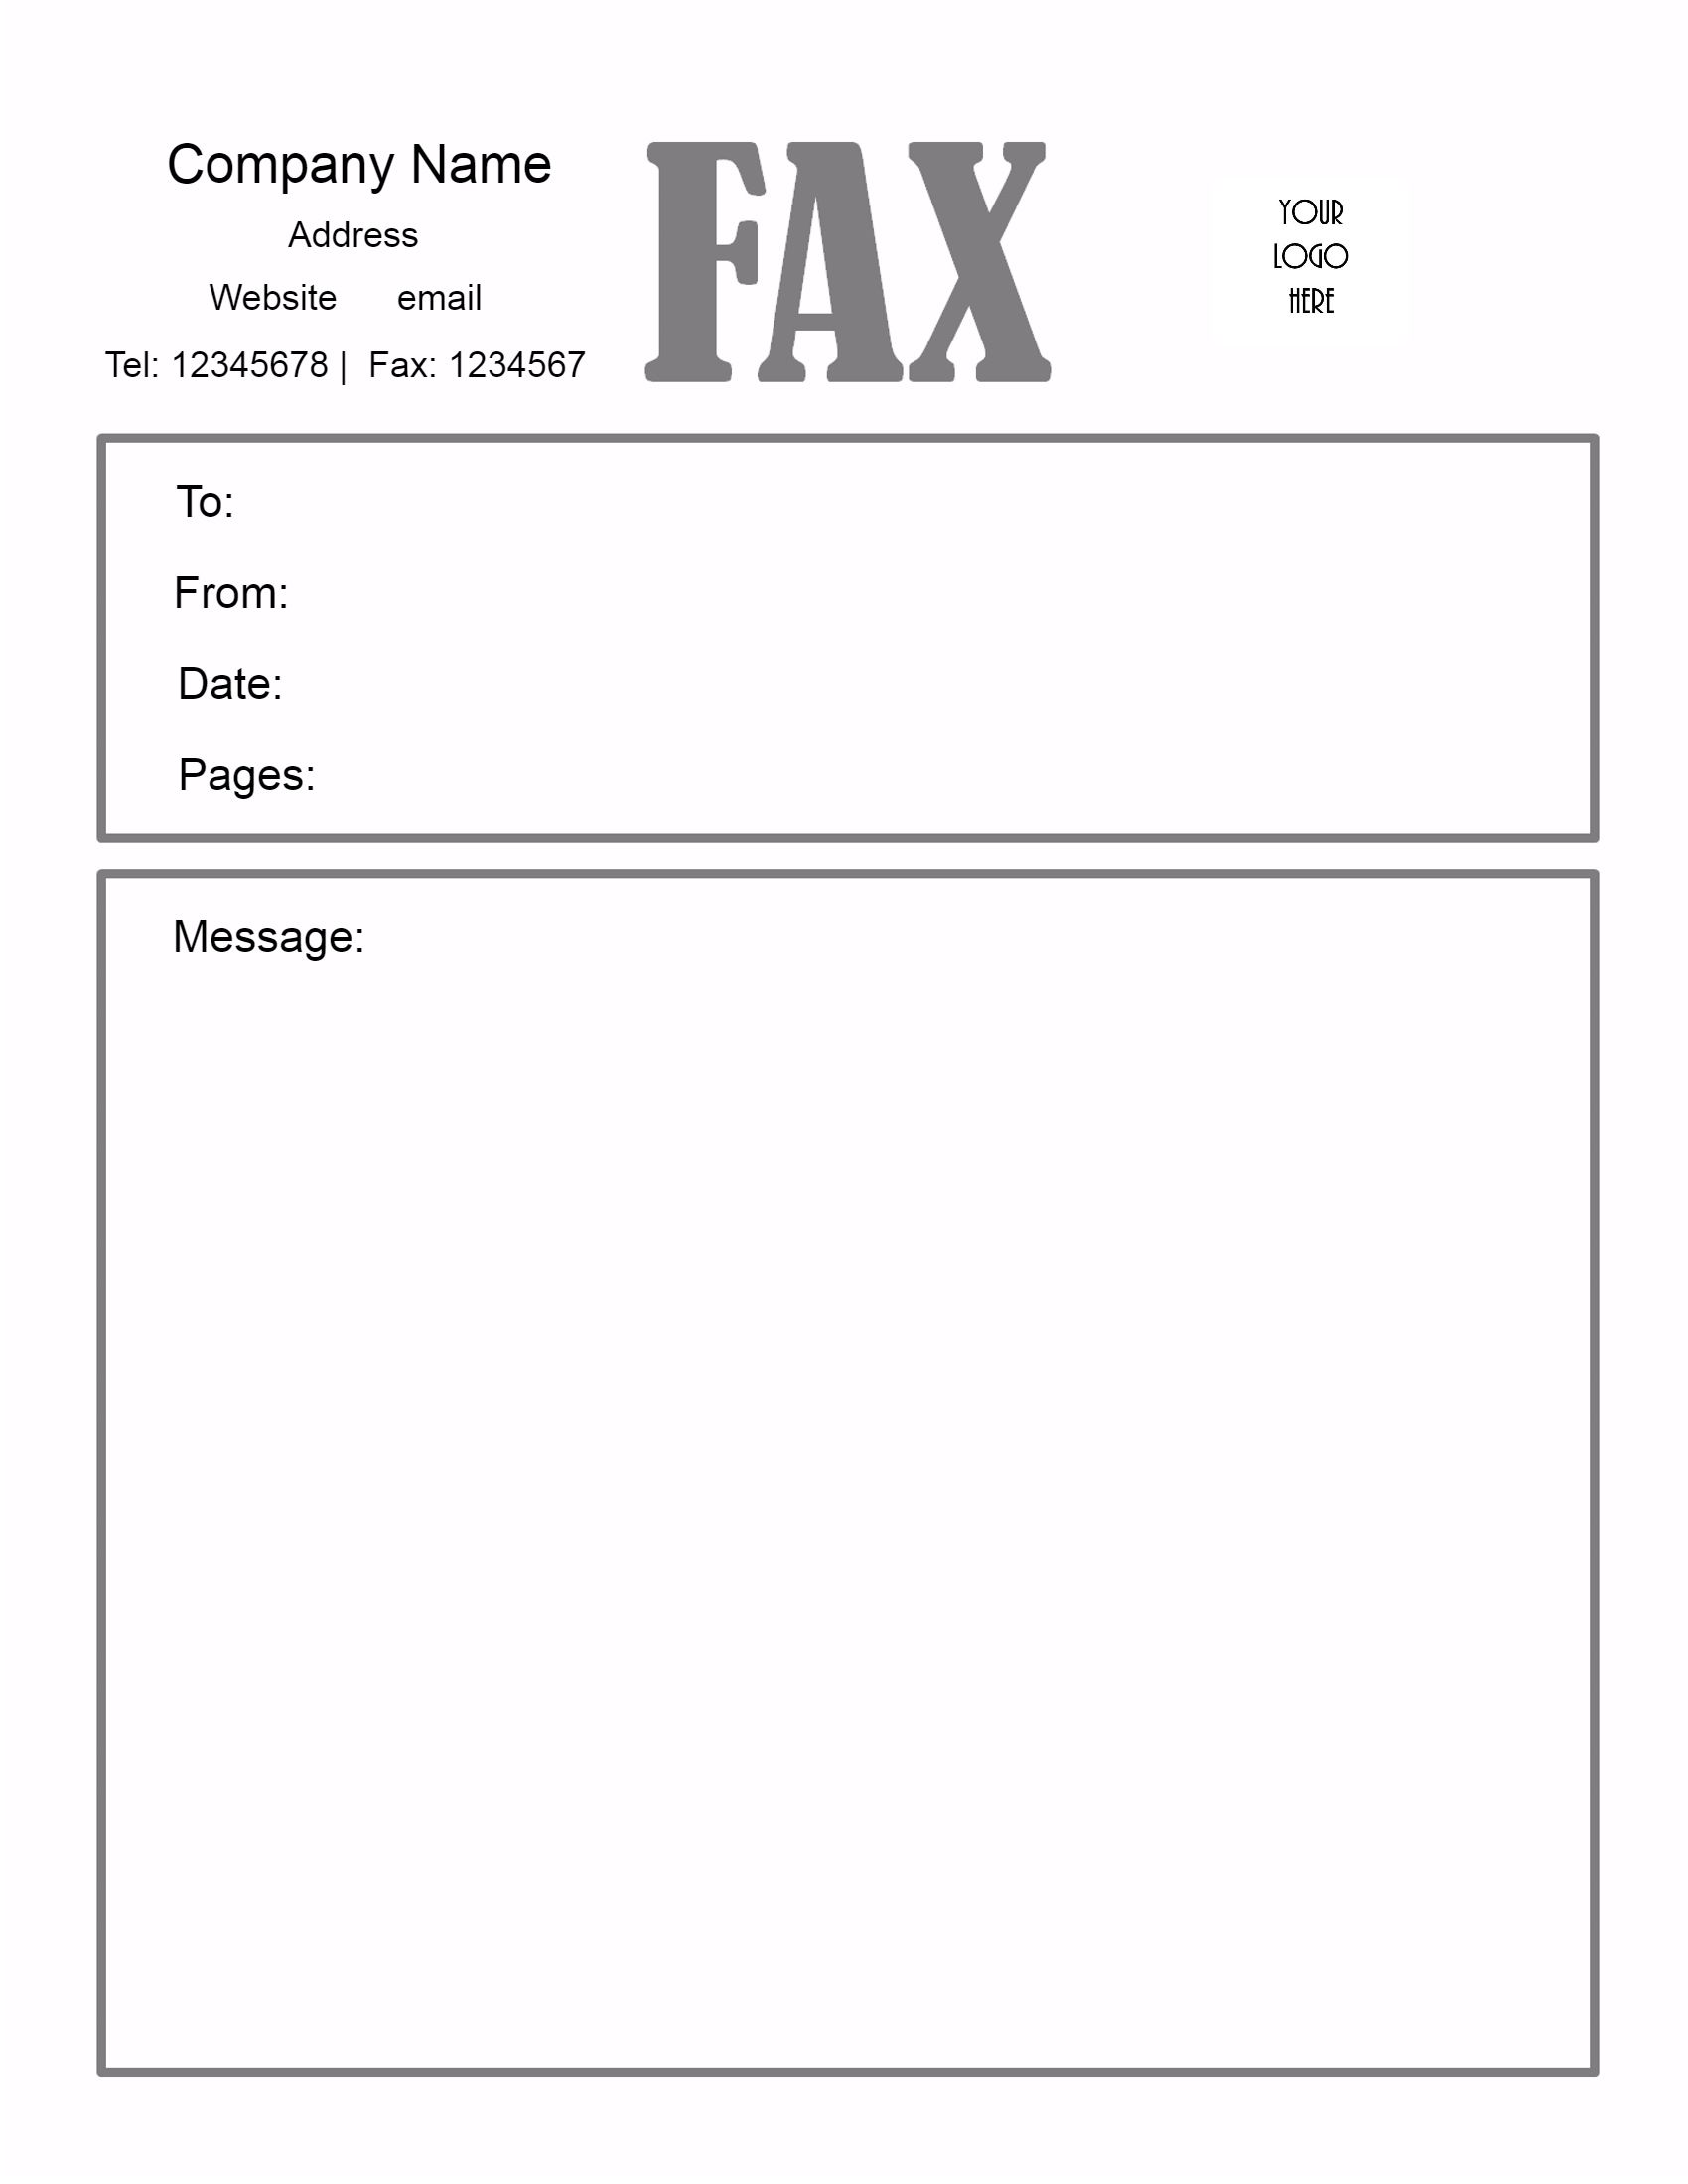 fax cover letter doc   Torku